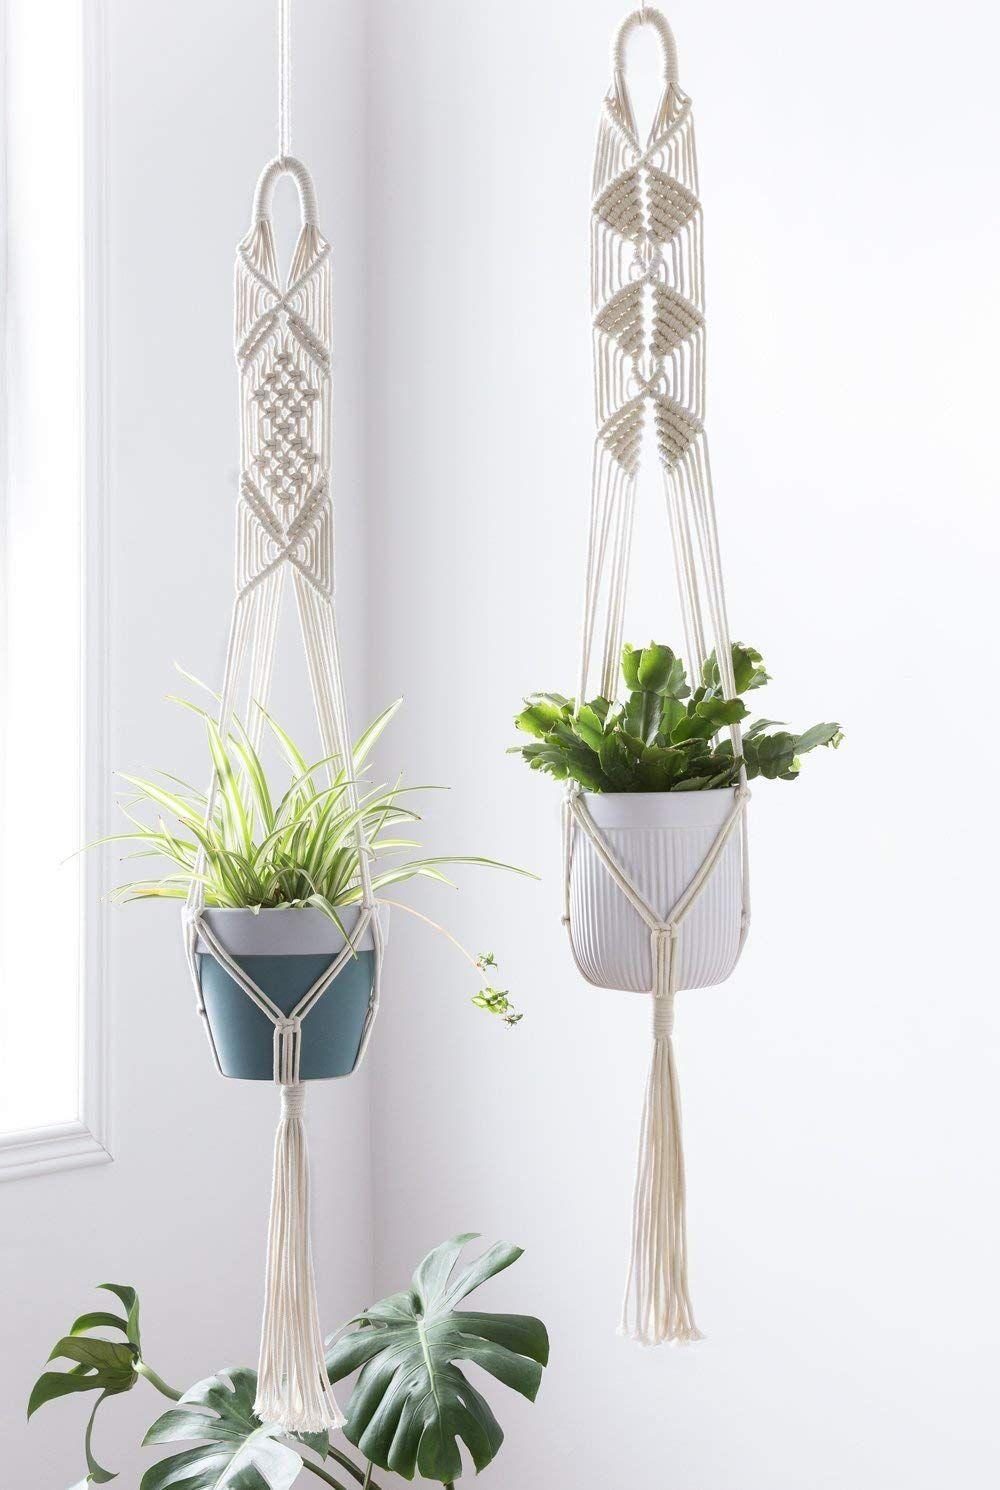 Amazon Com Mkono Macrame Plant Hanger Indoor Wall Hanging Planter Basket Flower Pot Holder Boho Home D In 2020 Plant Hanger Crochet Plant Hanger Macrame Plant Hangers